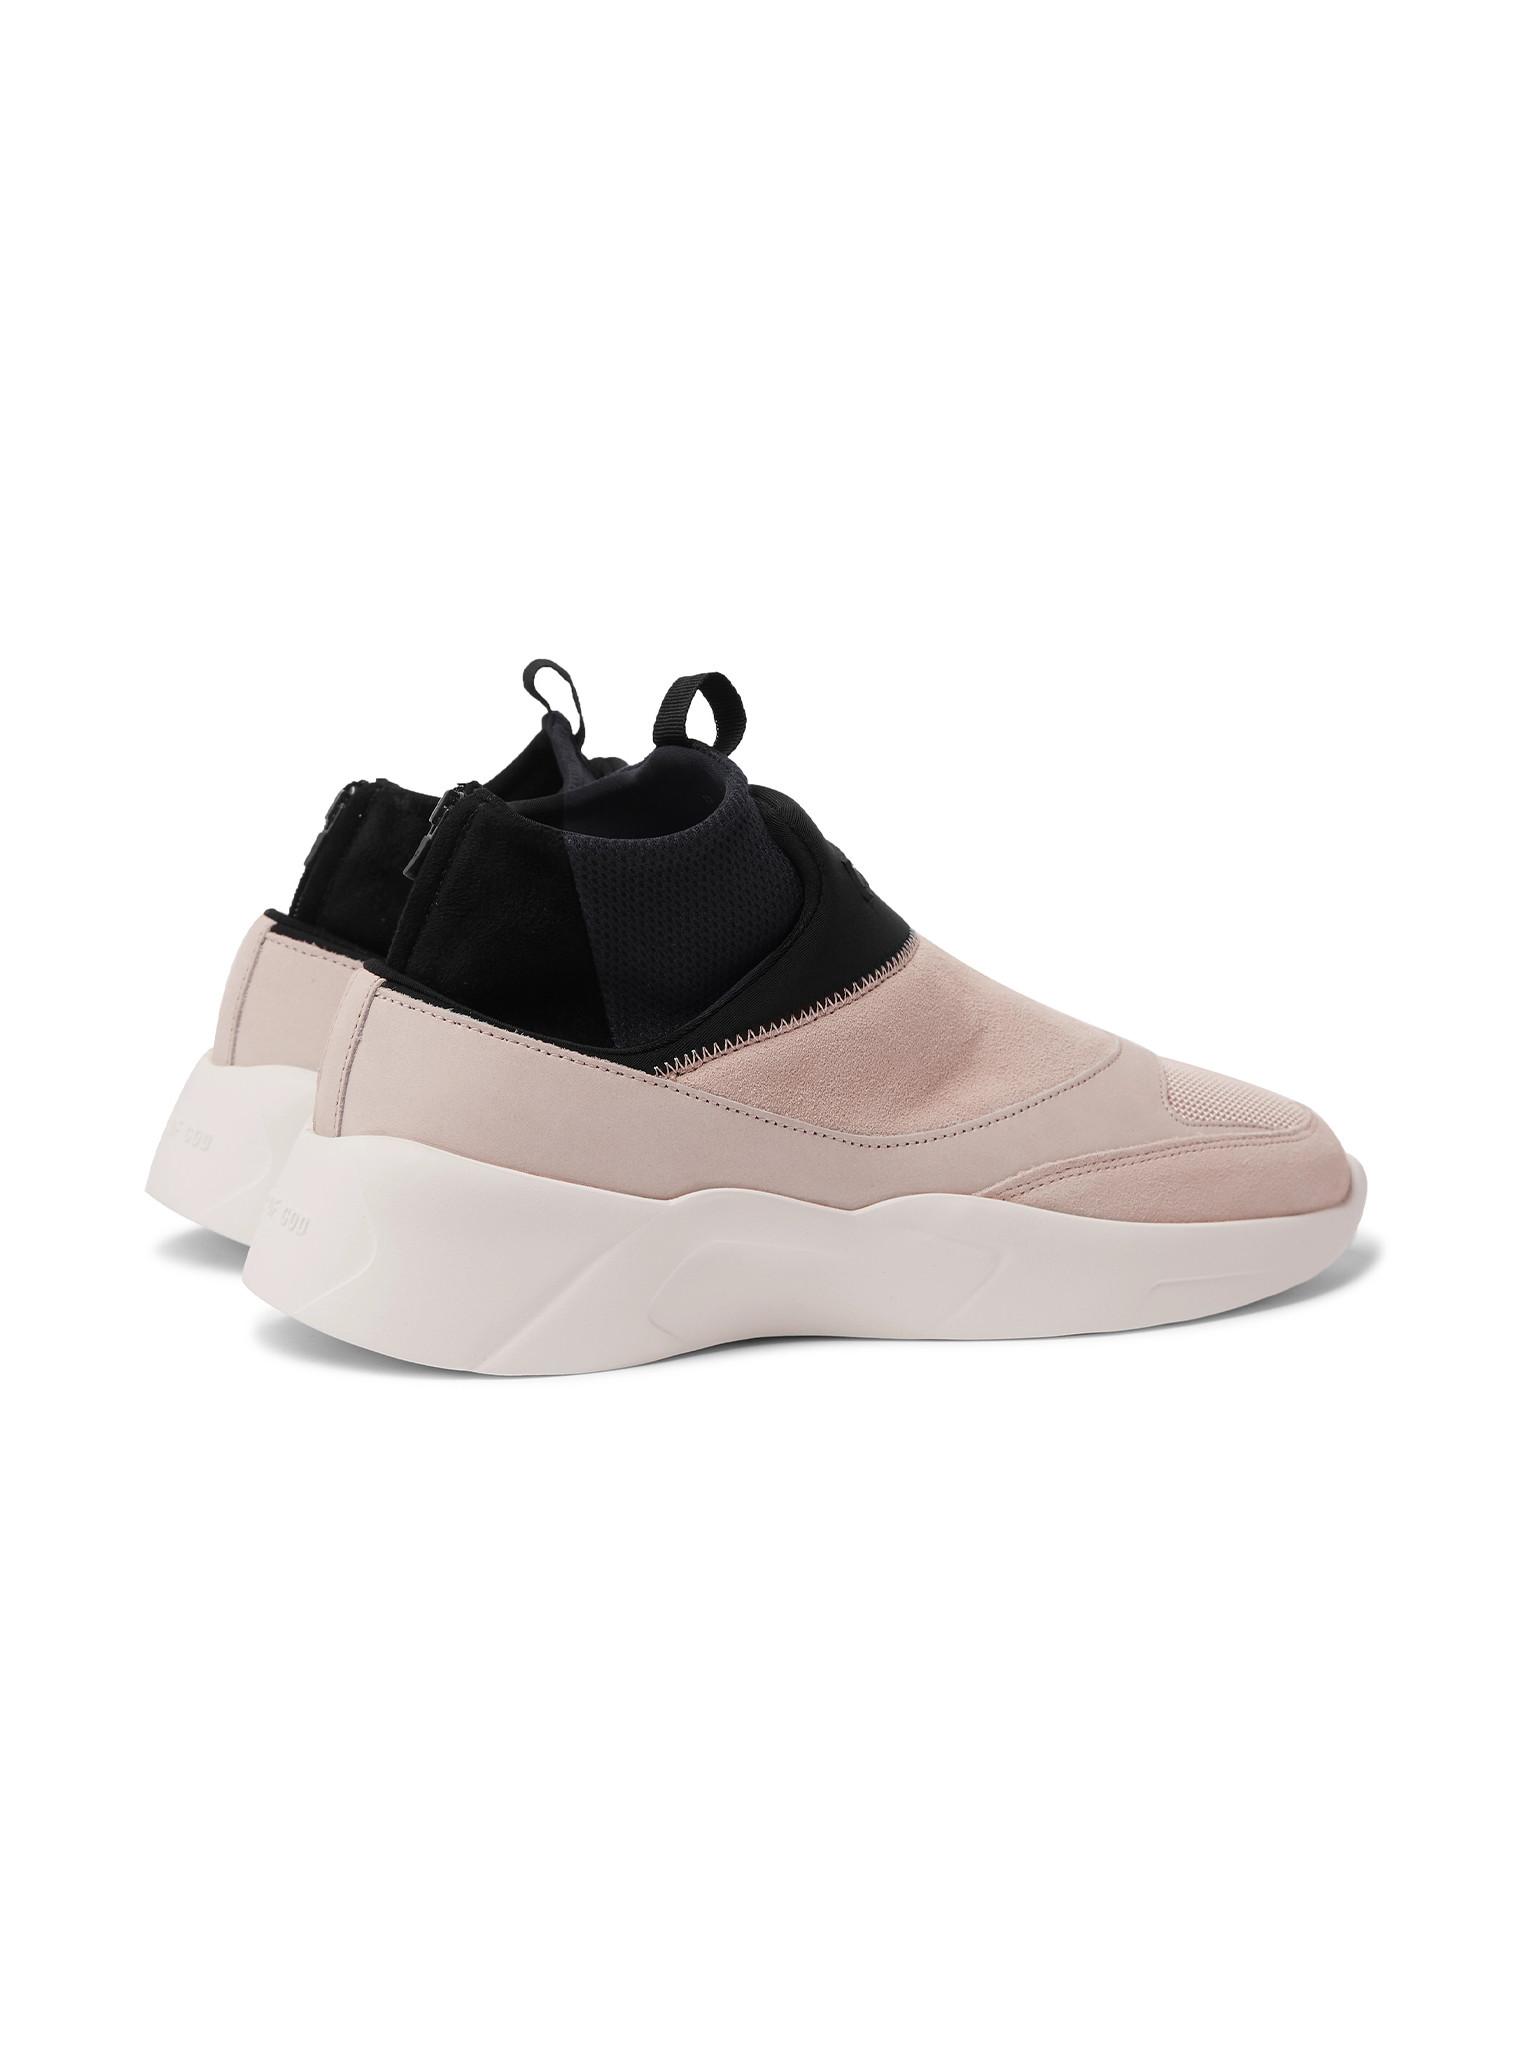 Suede, Mesh And Neoprene Sneakers